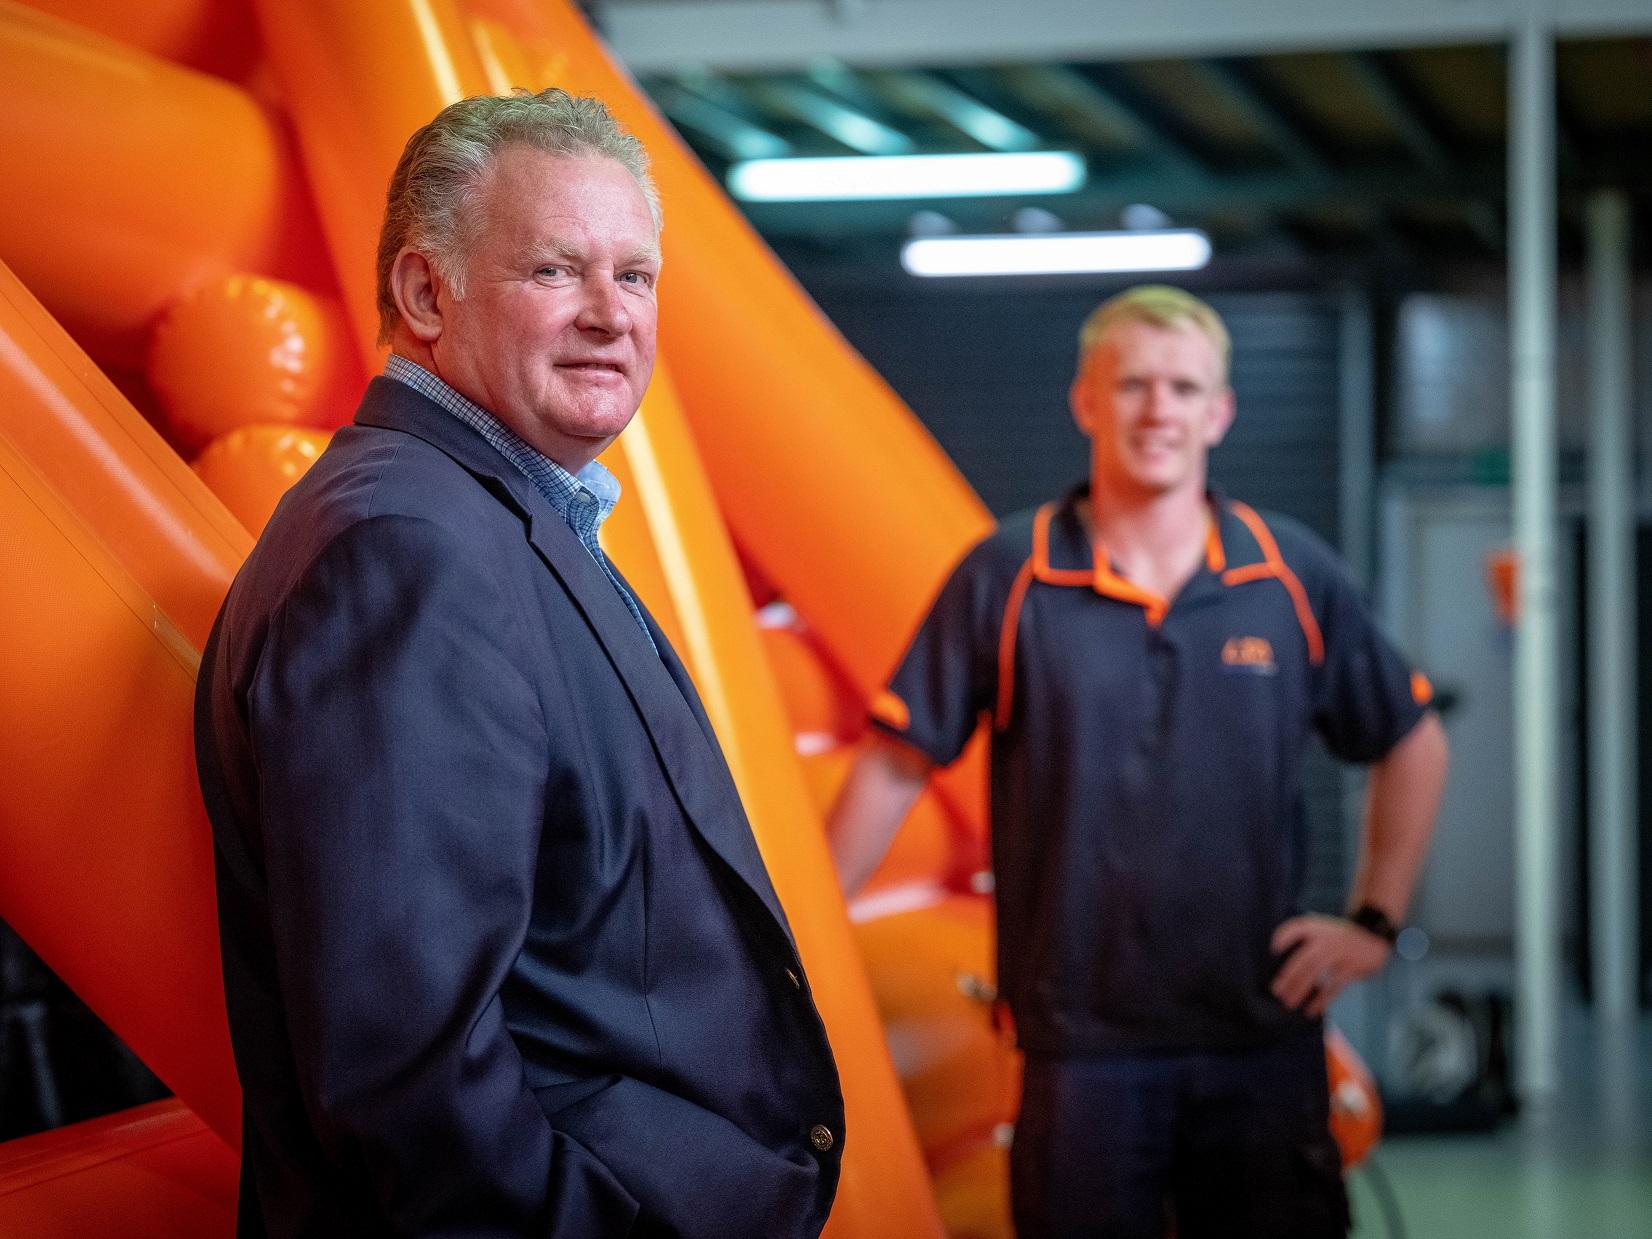 'Tasmania's brand awareness unsurpassed'